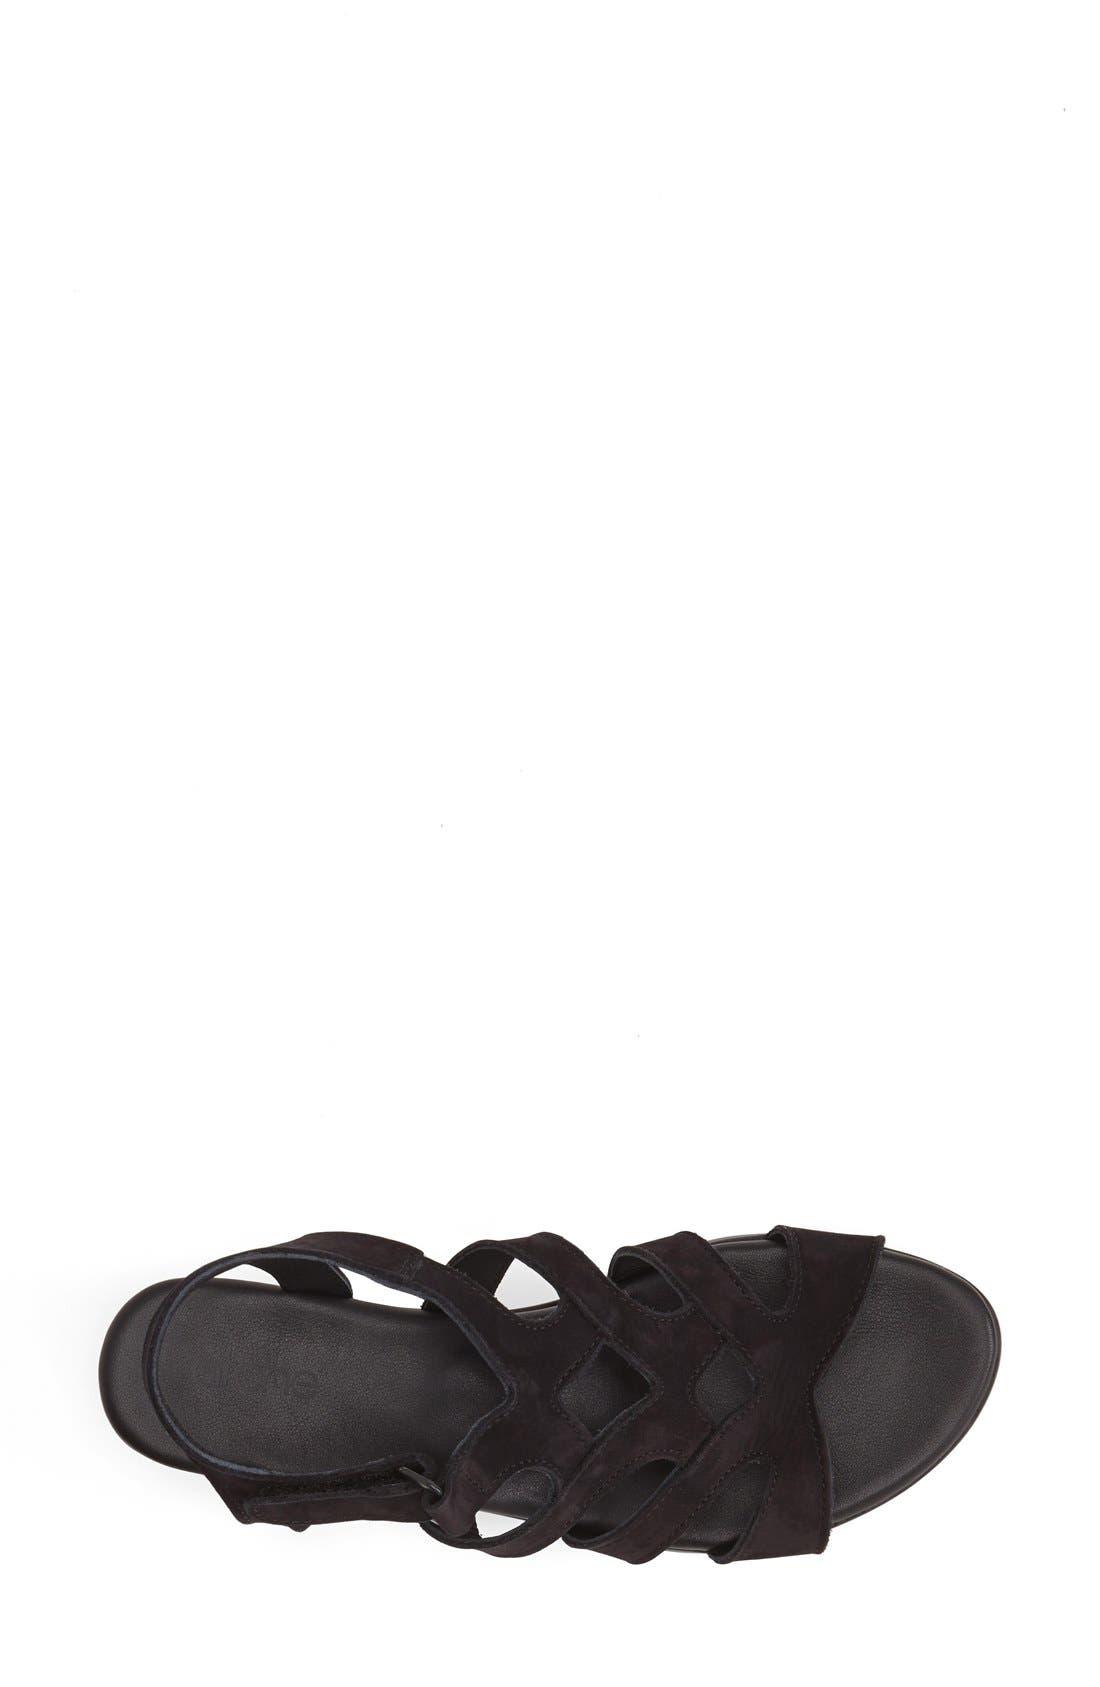 'Obela' Water Resistant Leather Sandal,                             Alternate thumbnail 14, color,